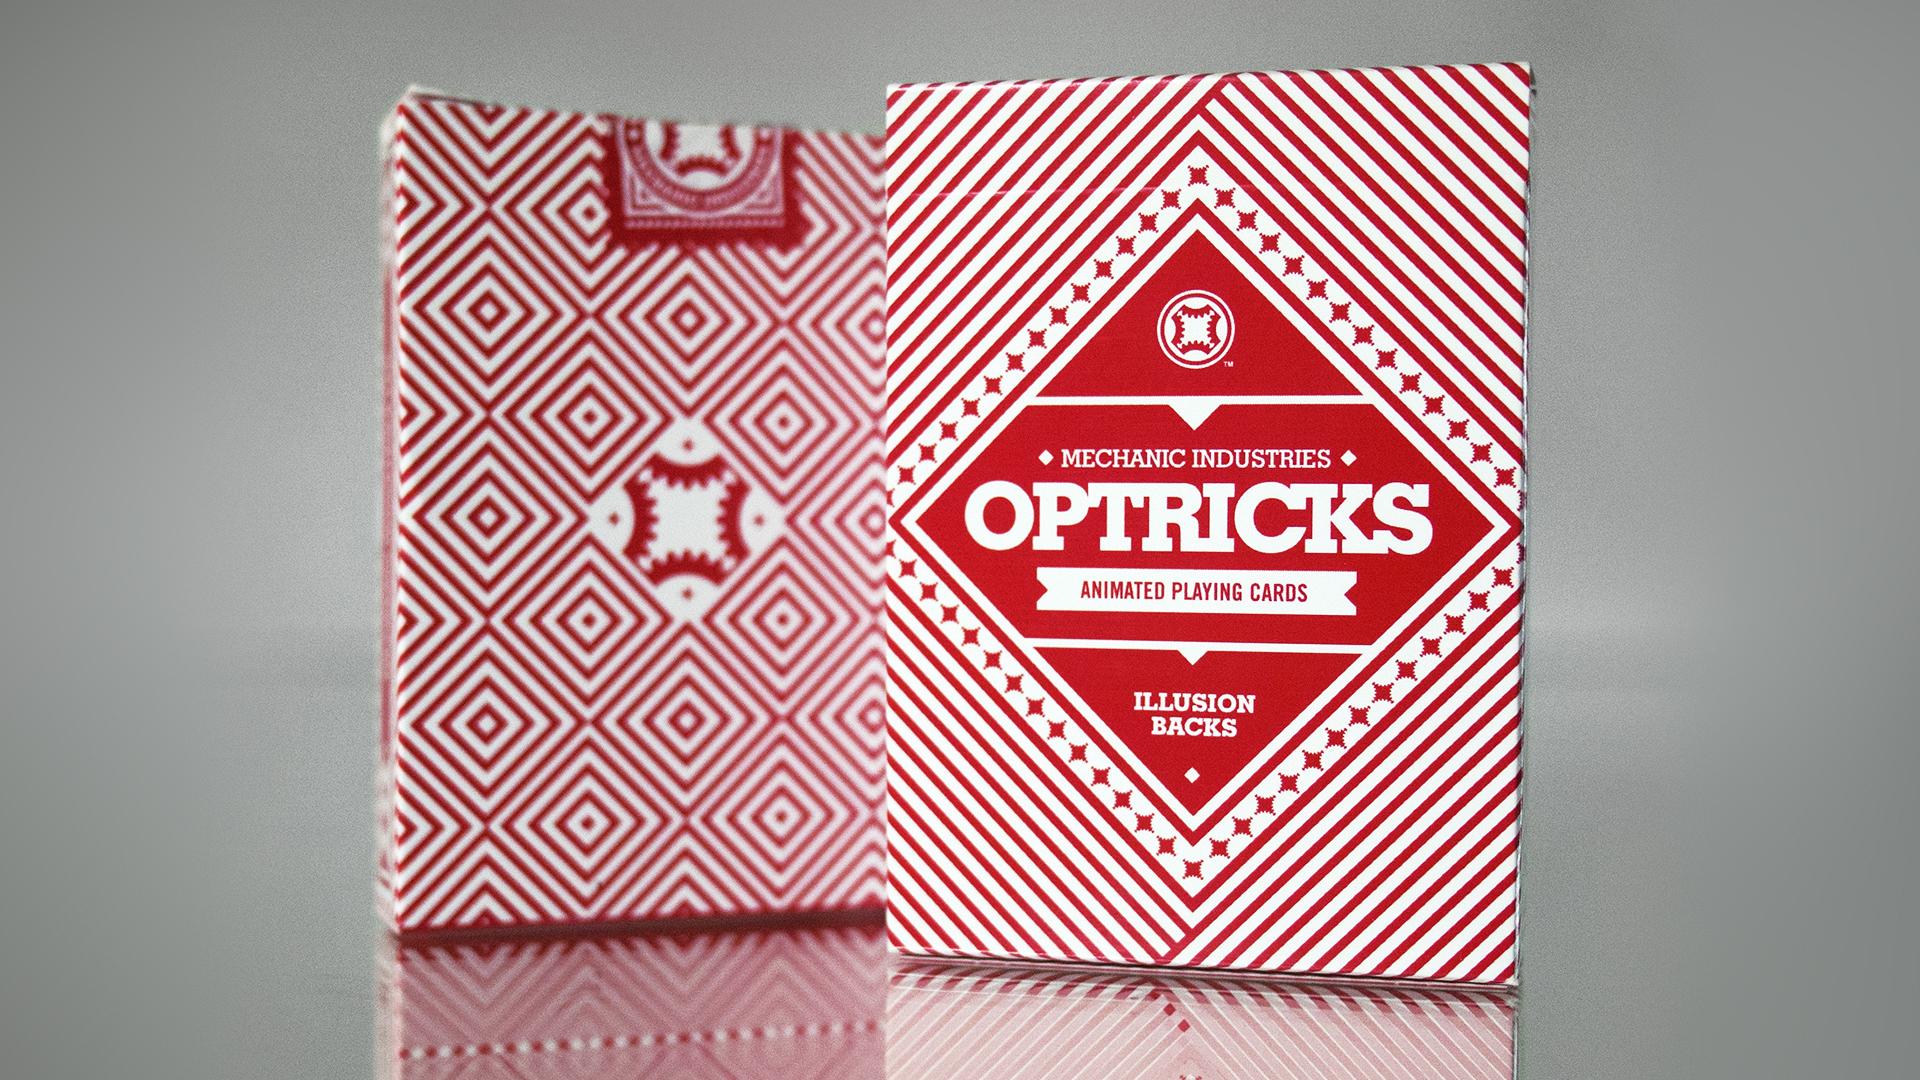 OPTRICKS RED    optical iLLUSION GAFFS    VIEW DETAILS